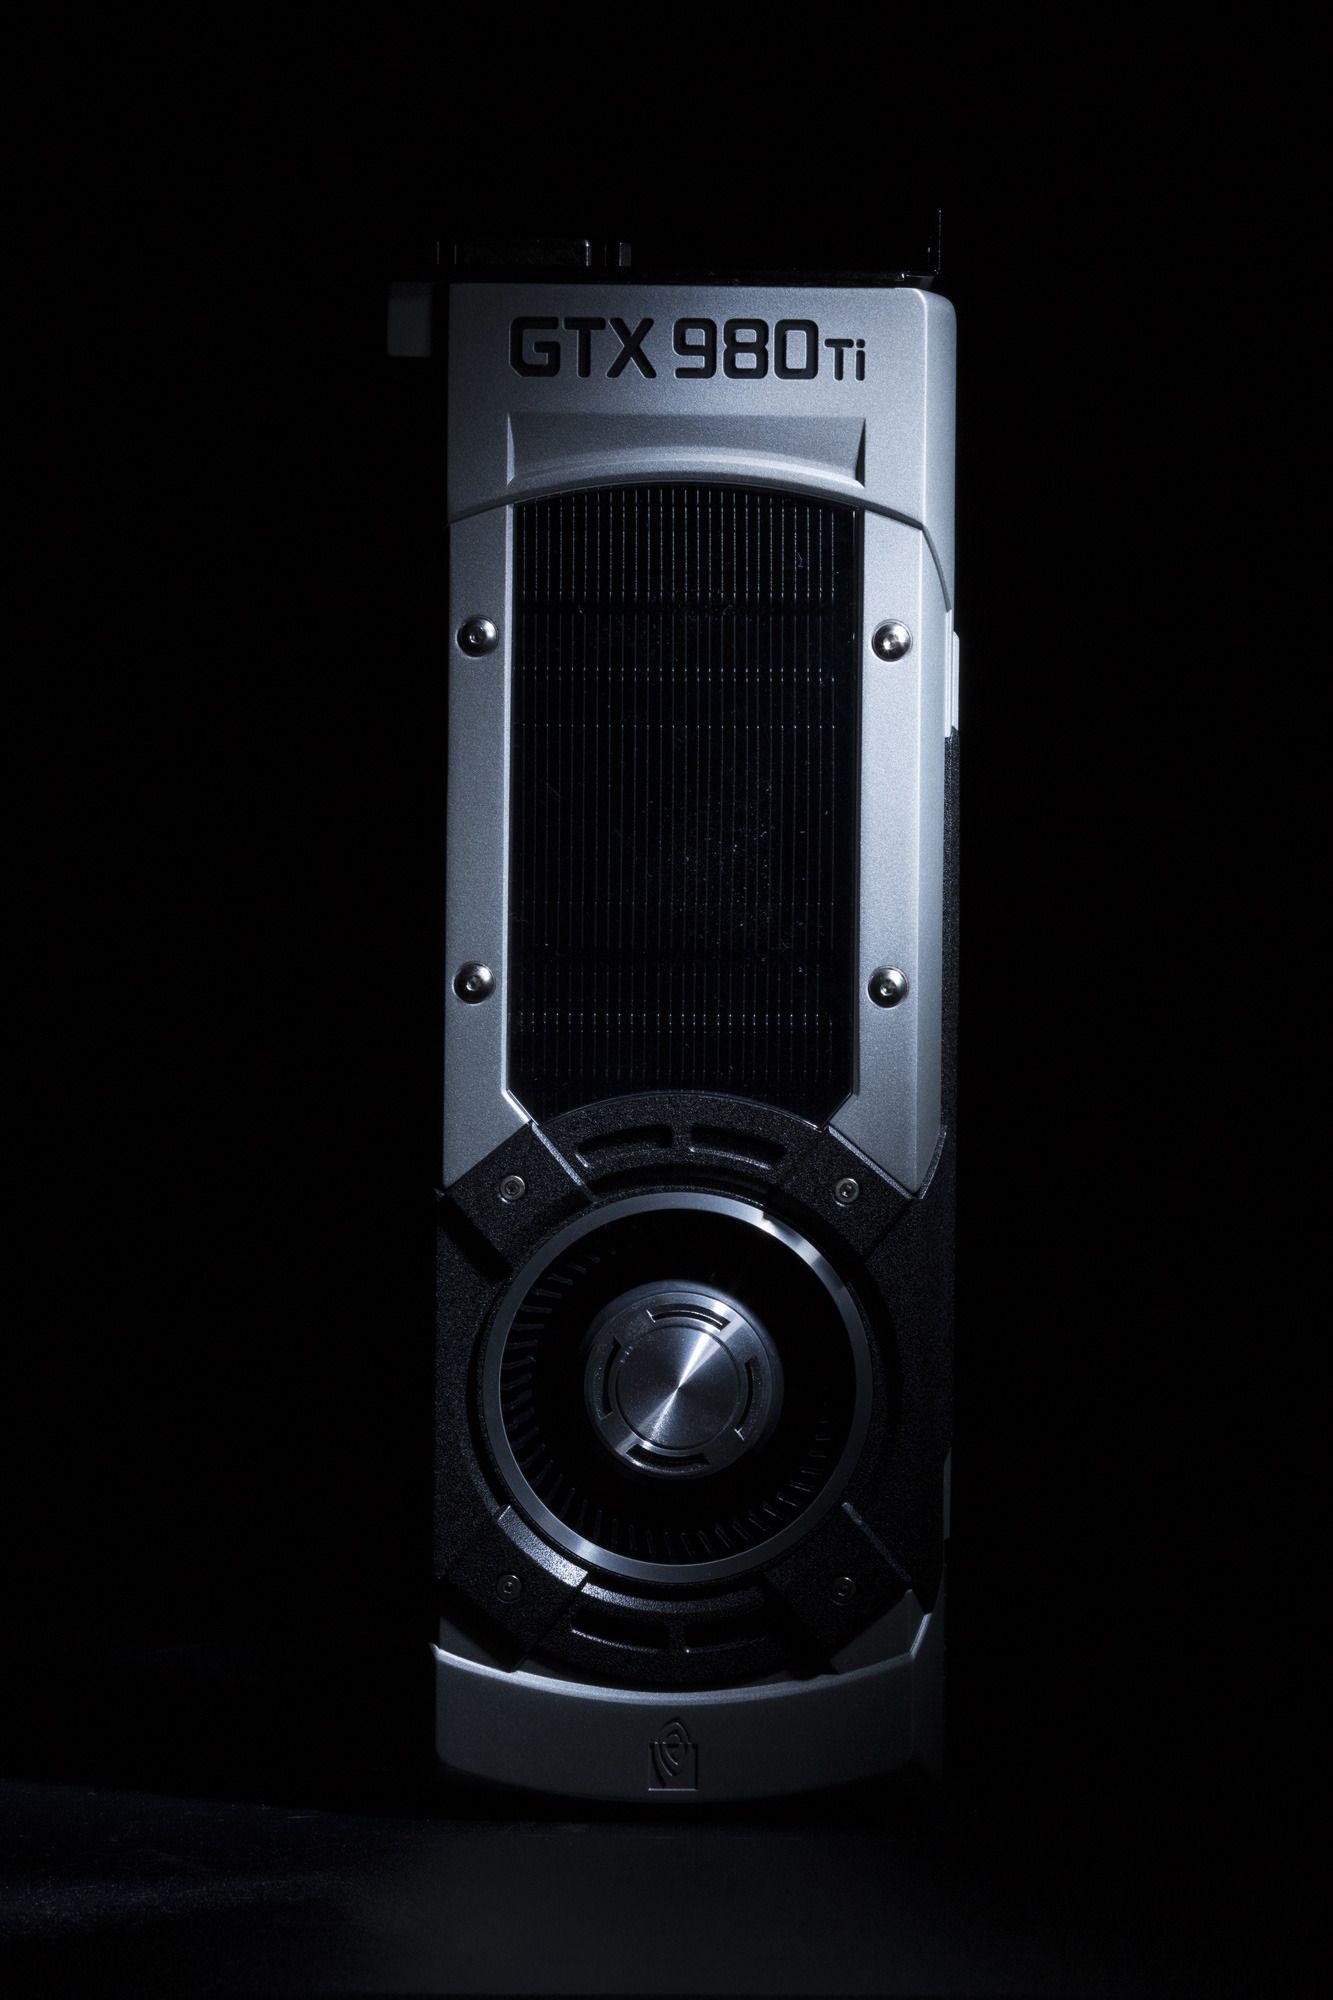 Nvidia GeForce GTX 980 Ti. Foto: Nvidia